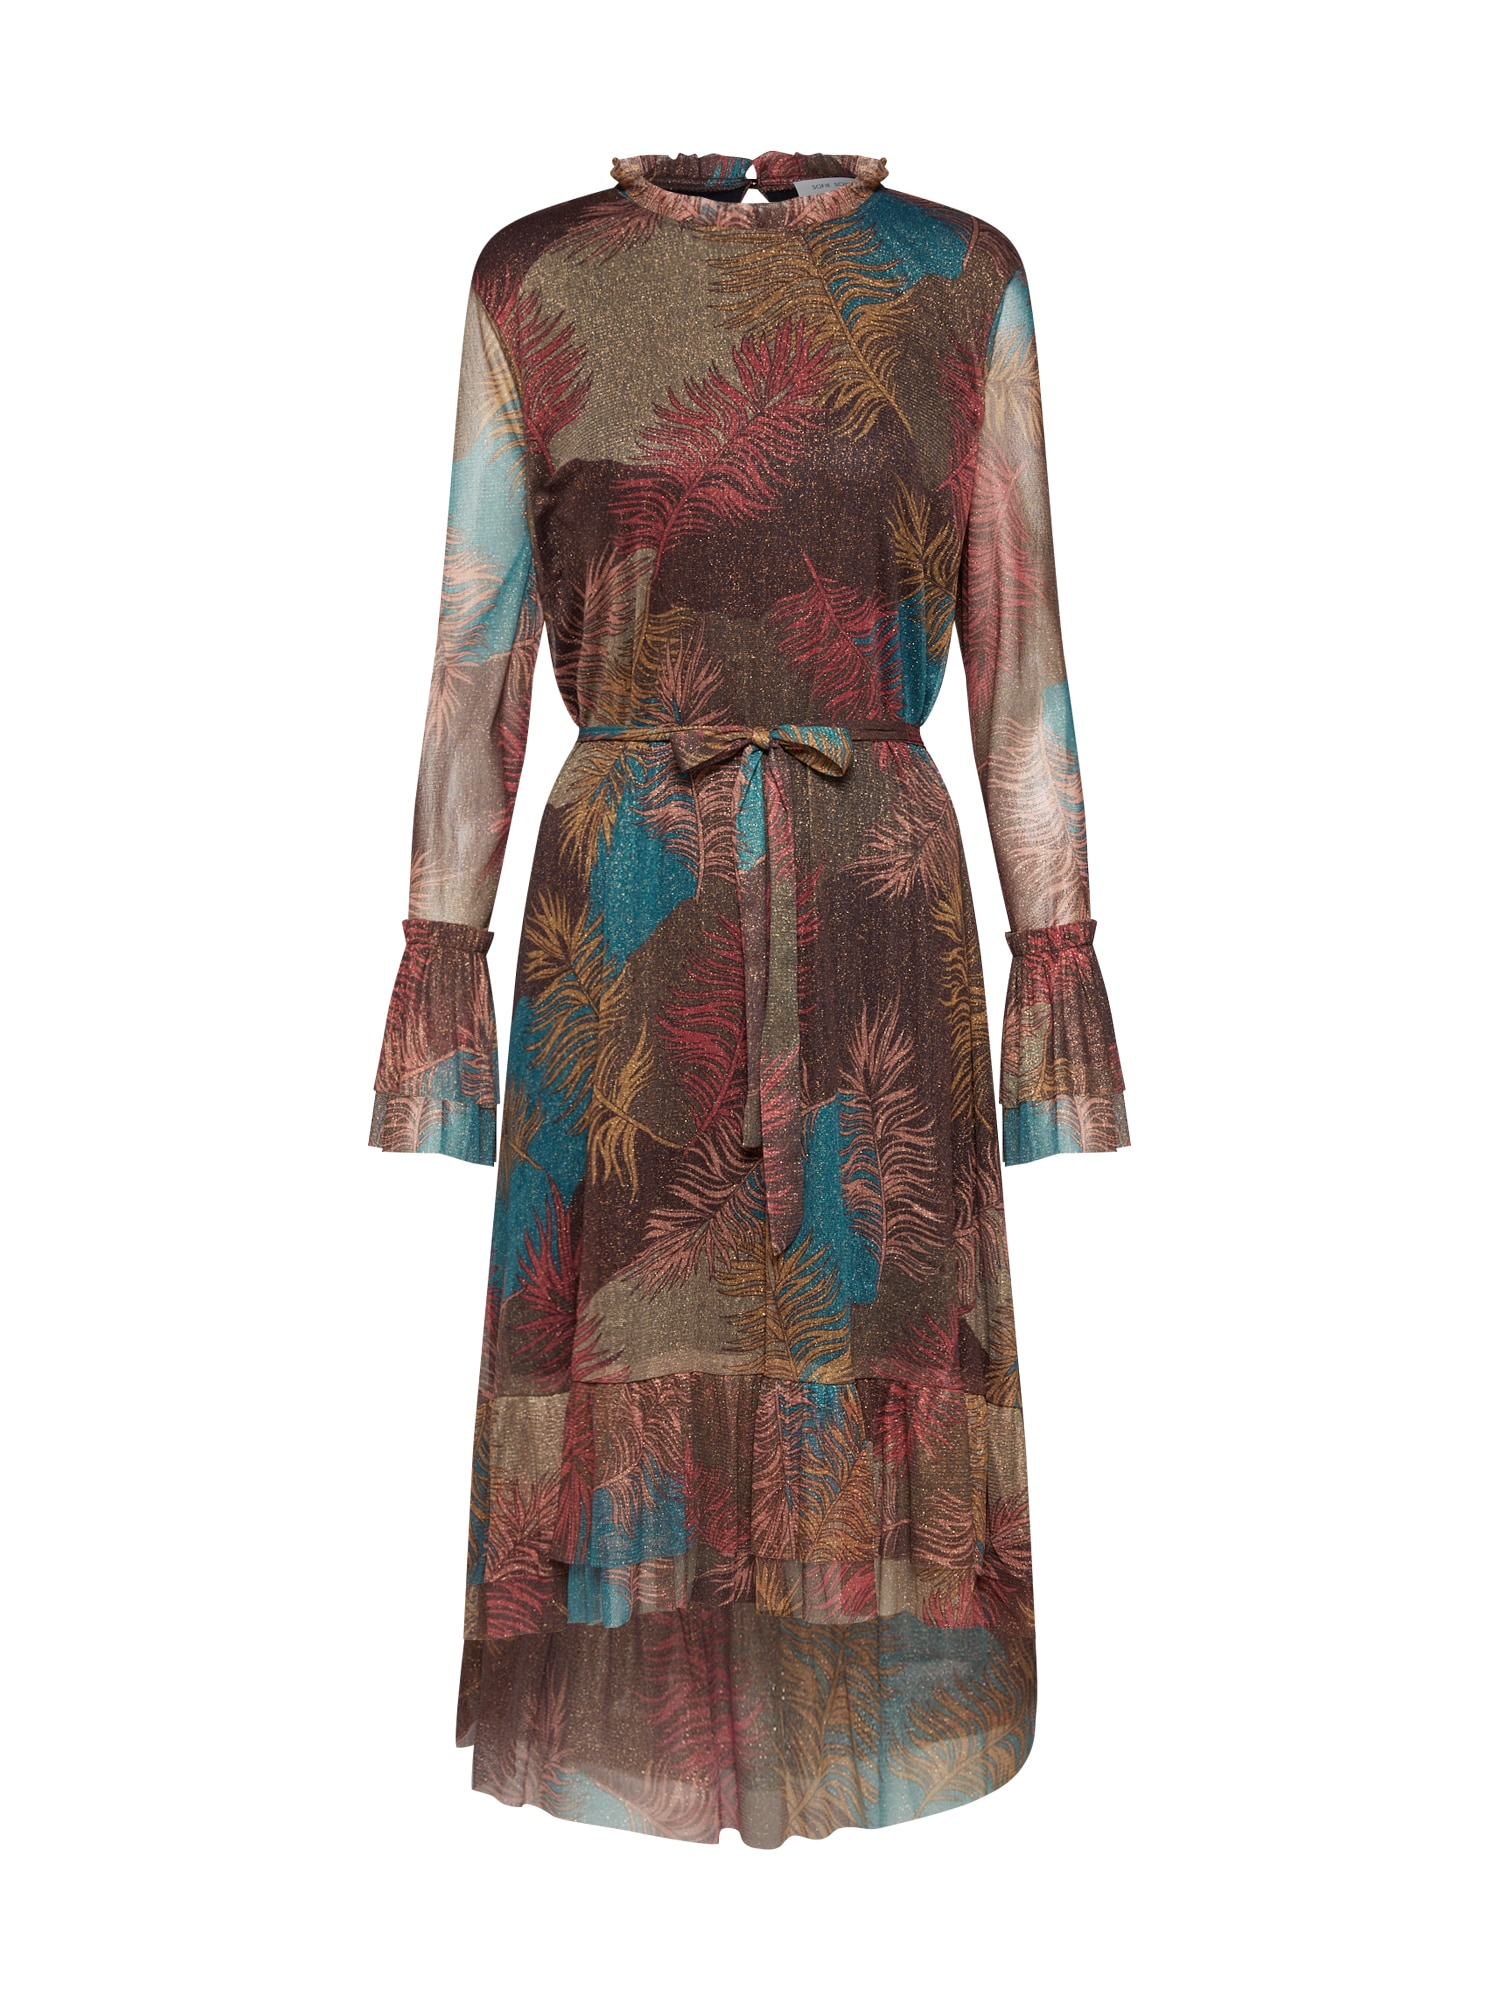 Letní šaty S191213 mix barev Sofie Schnoor